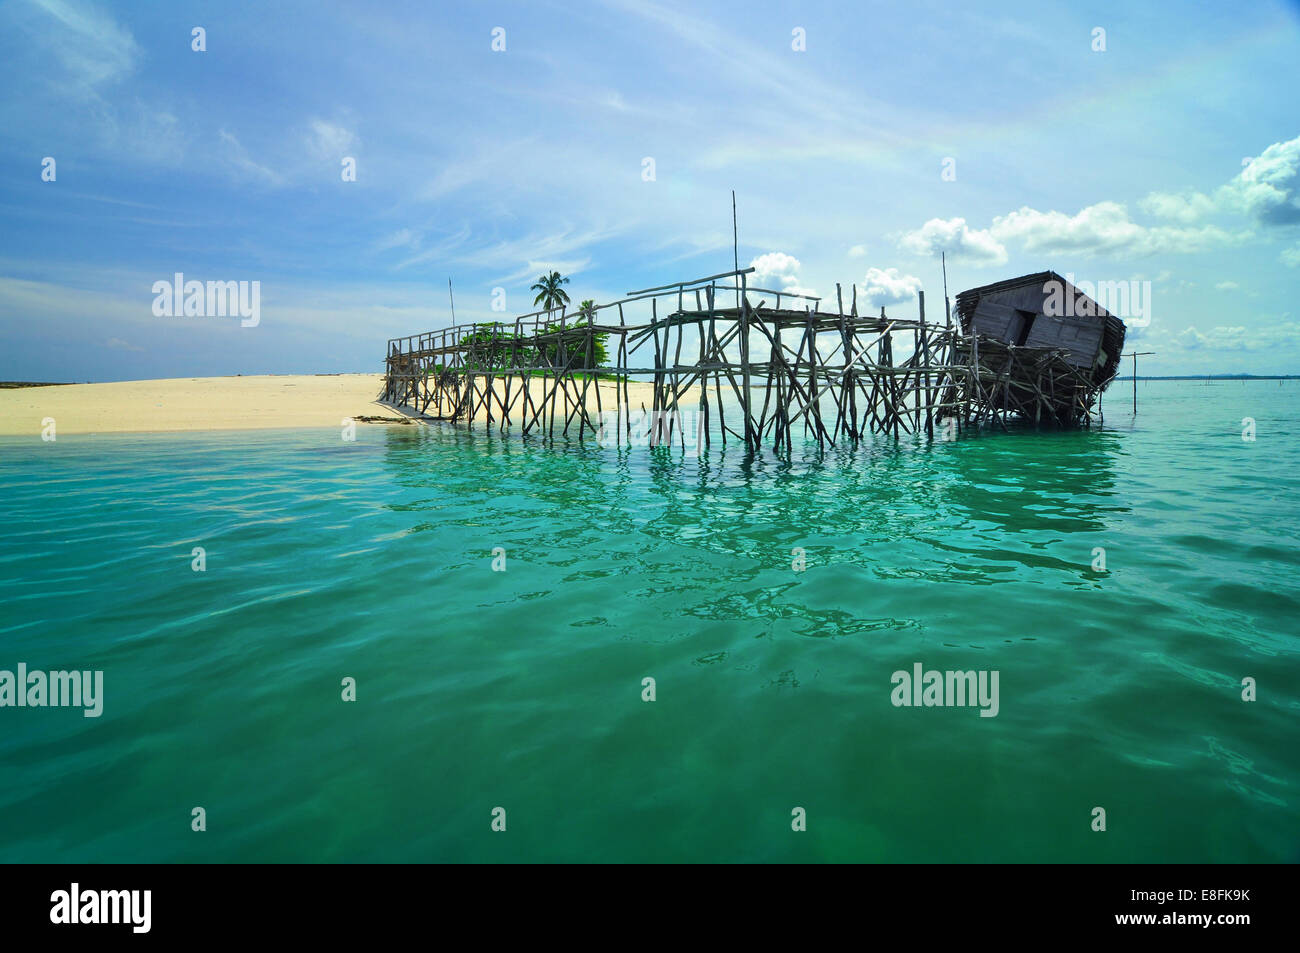 Indonesia, Bangka Belitung, Belitung Island Riau, Broken hut on pier - Stock Image